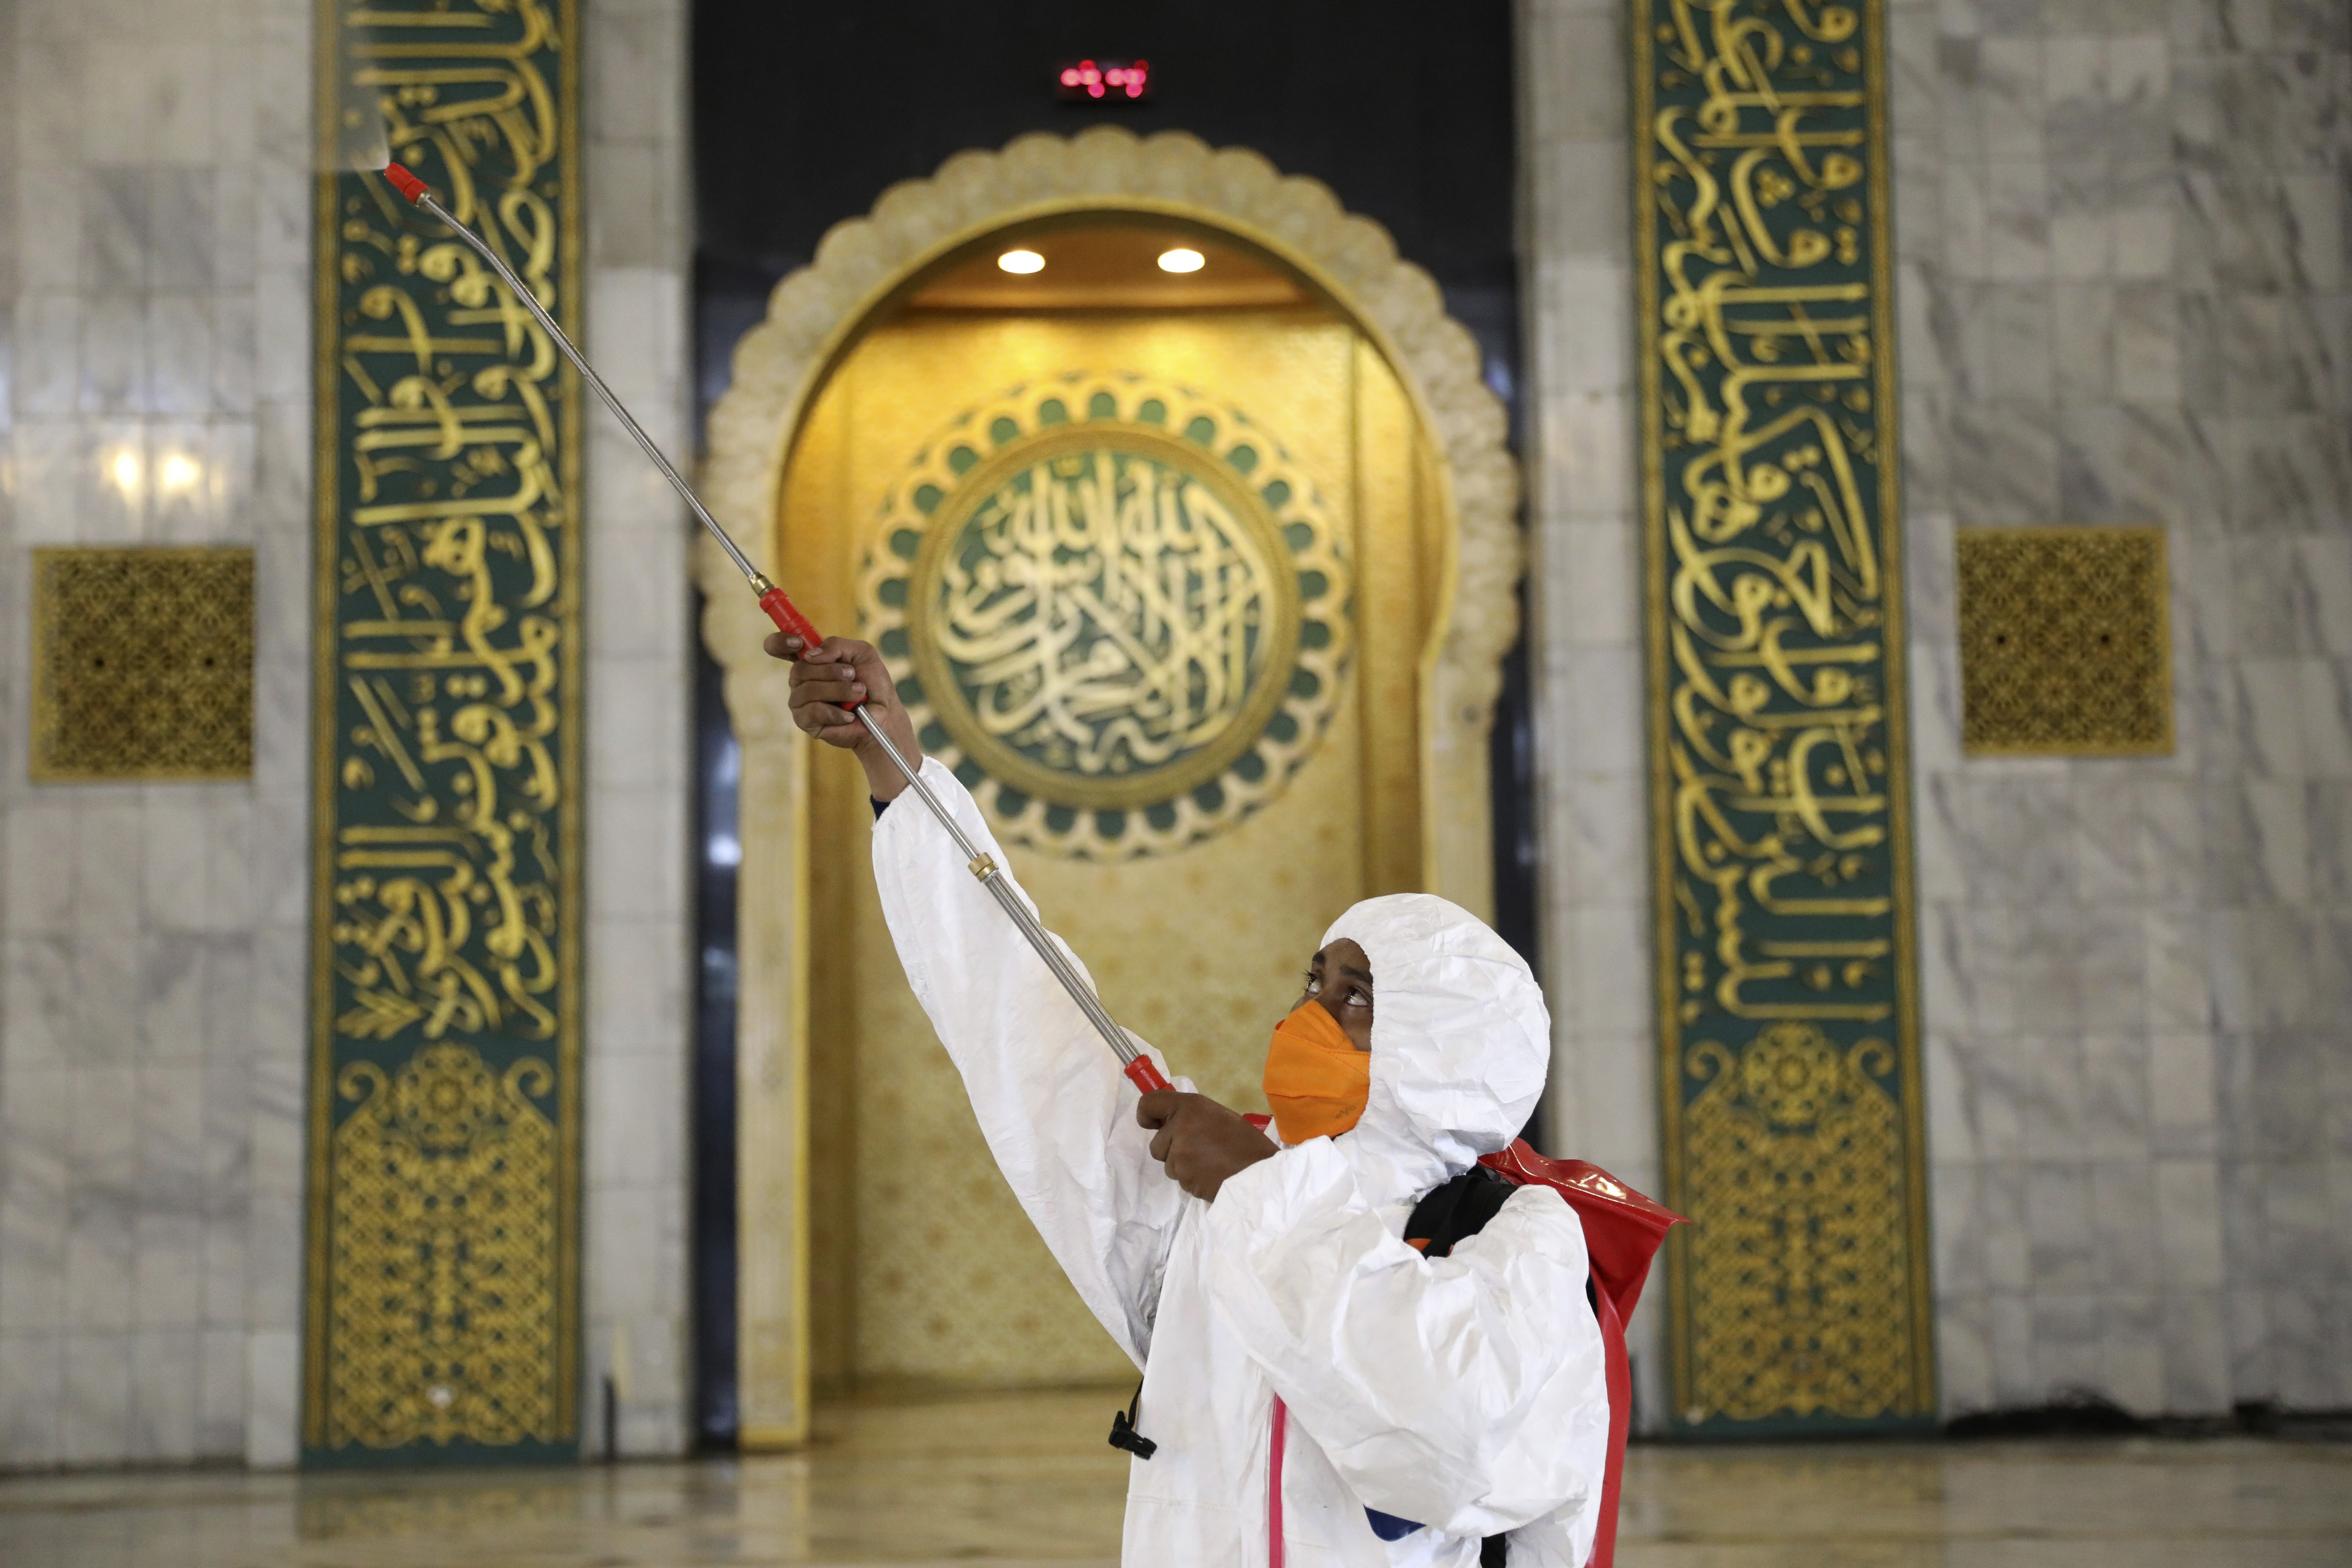 Thousands of Muslim pilgrims brave coronavirus to gather in Indonesia